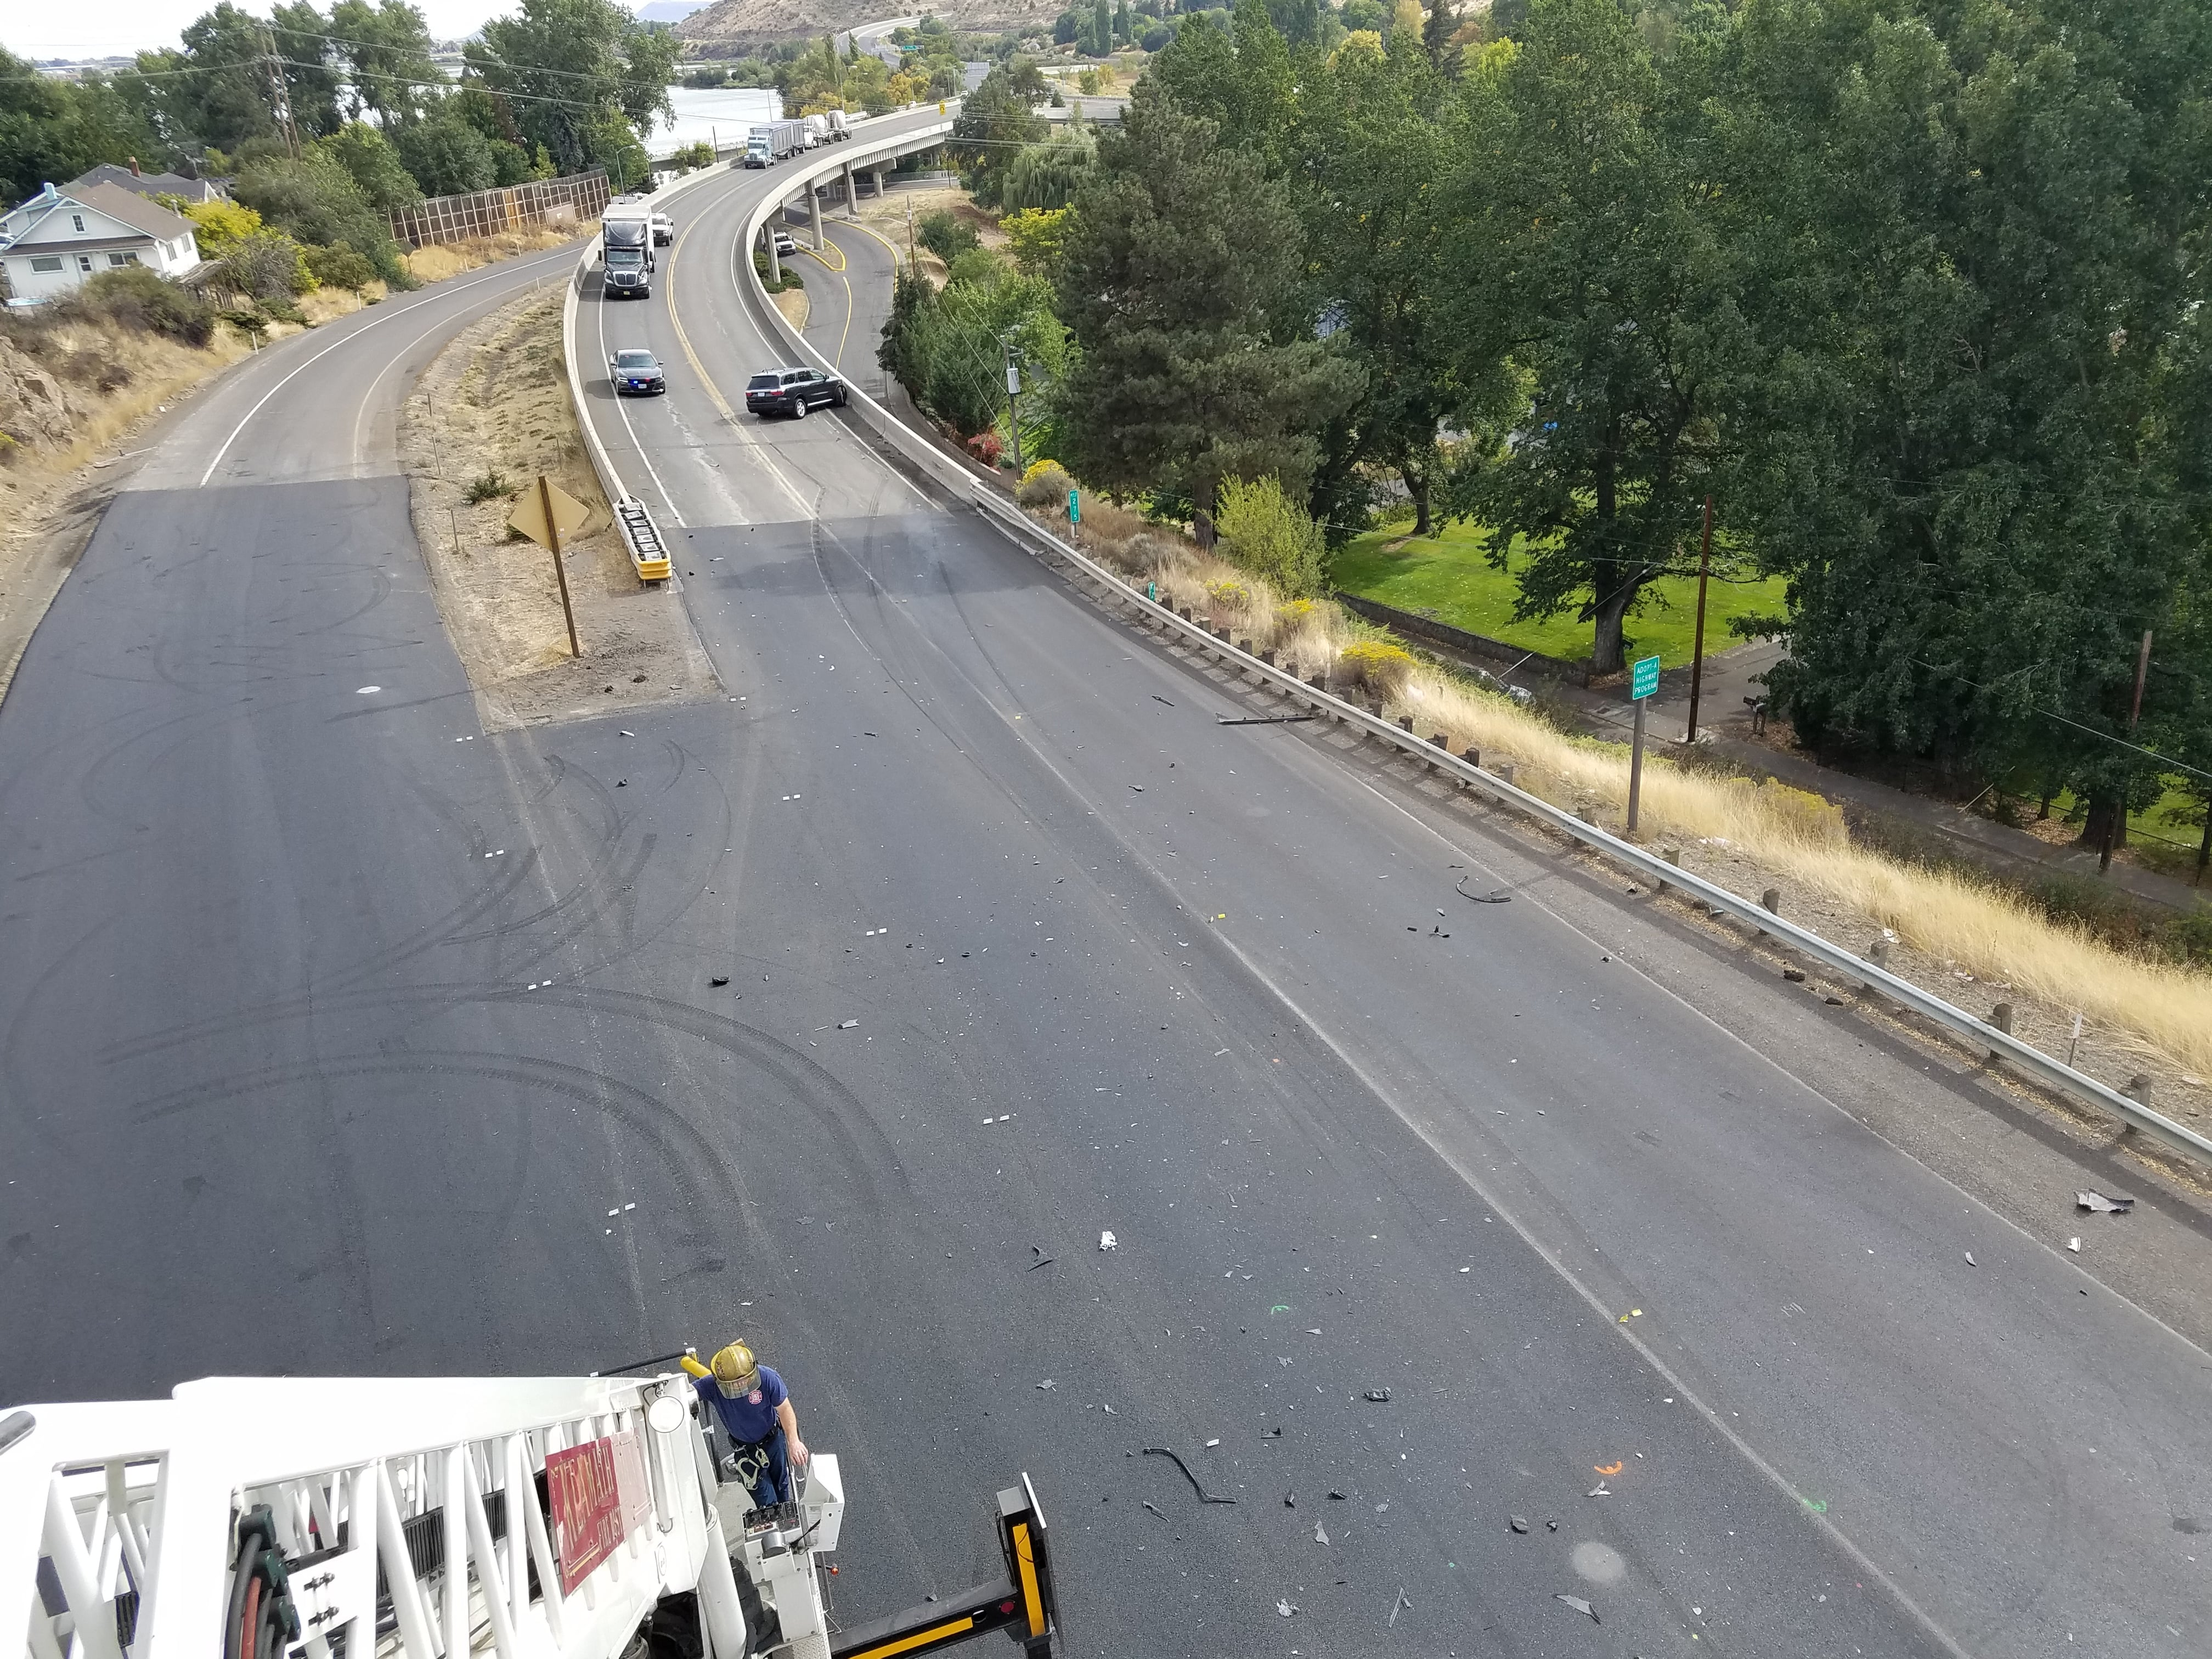 Klamath Falls woman dies in crash, distracted driving a